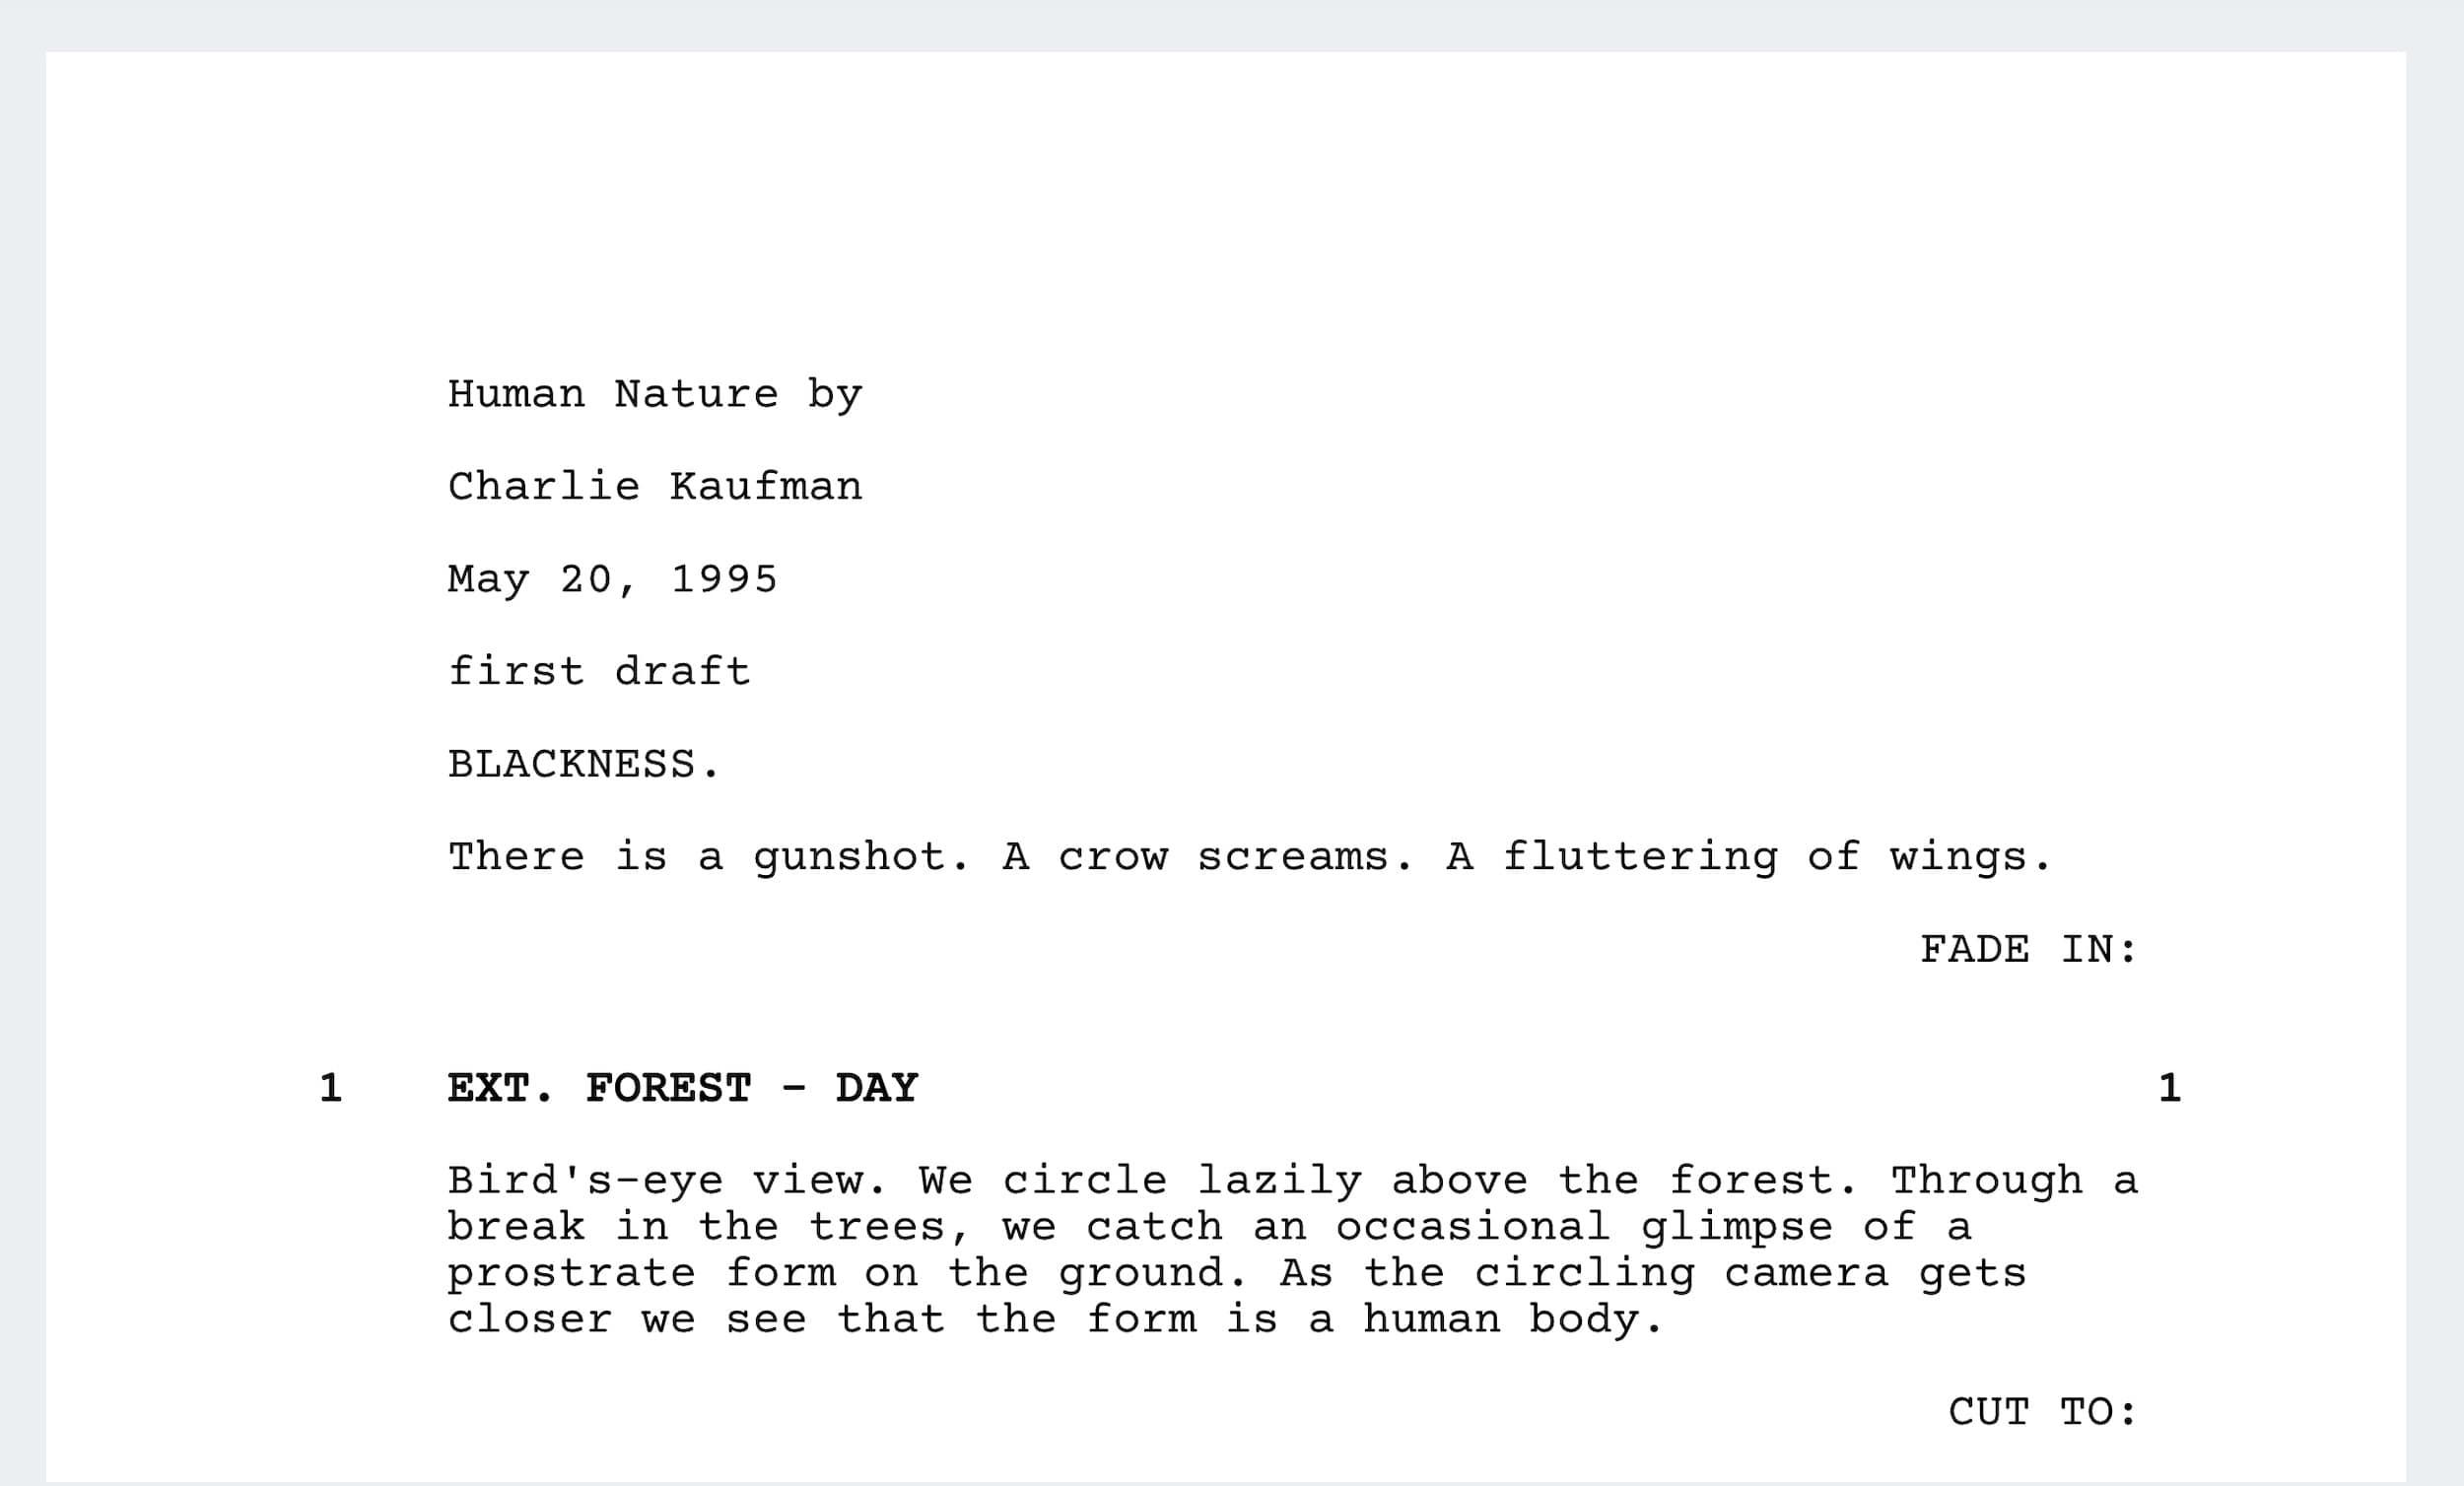 Best Charlie Kaufman Movies - Human Nature - StudioBinder